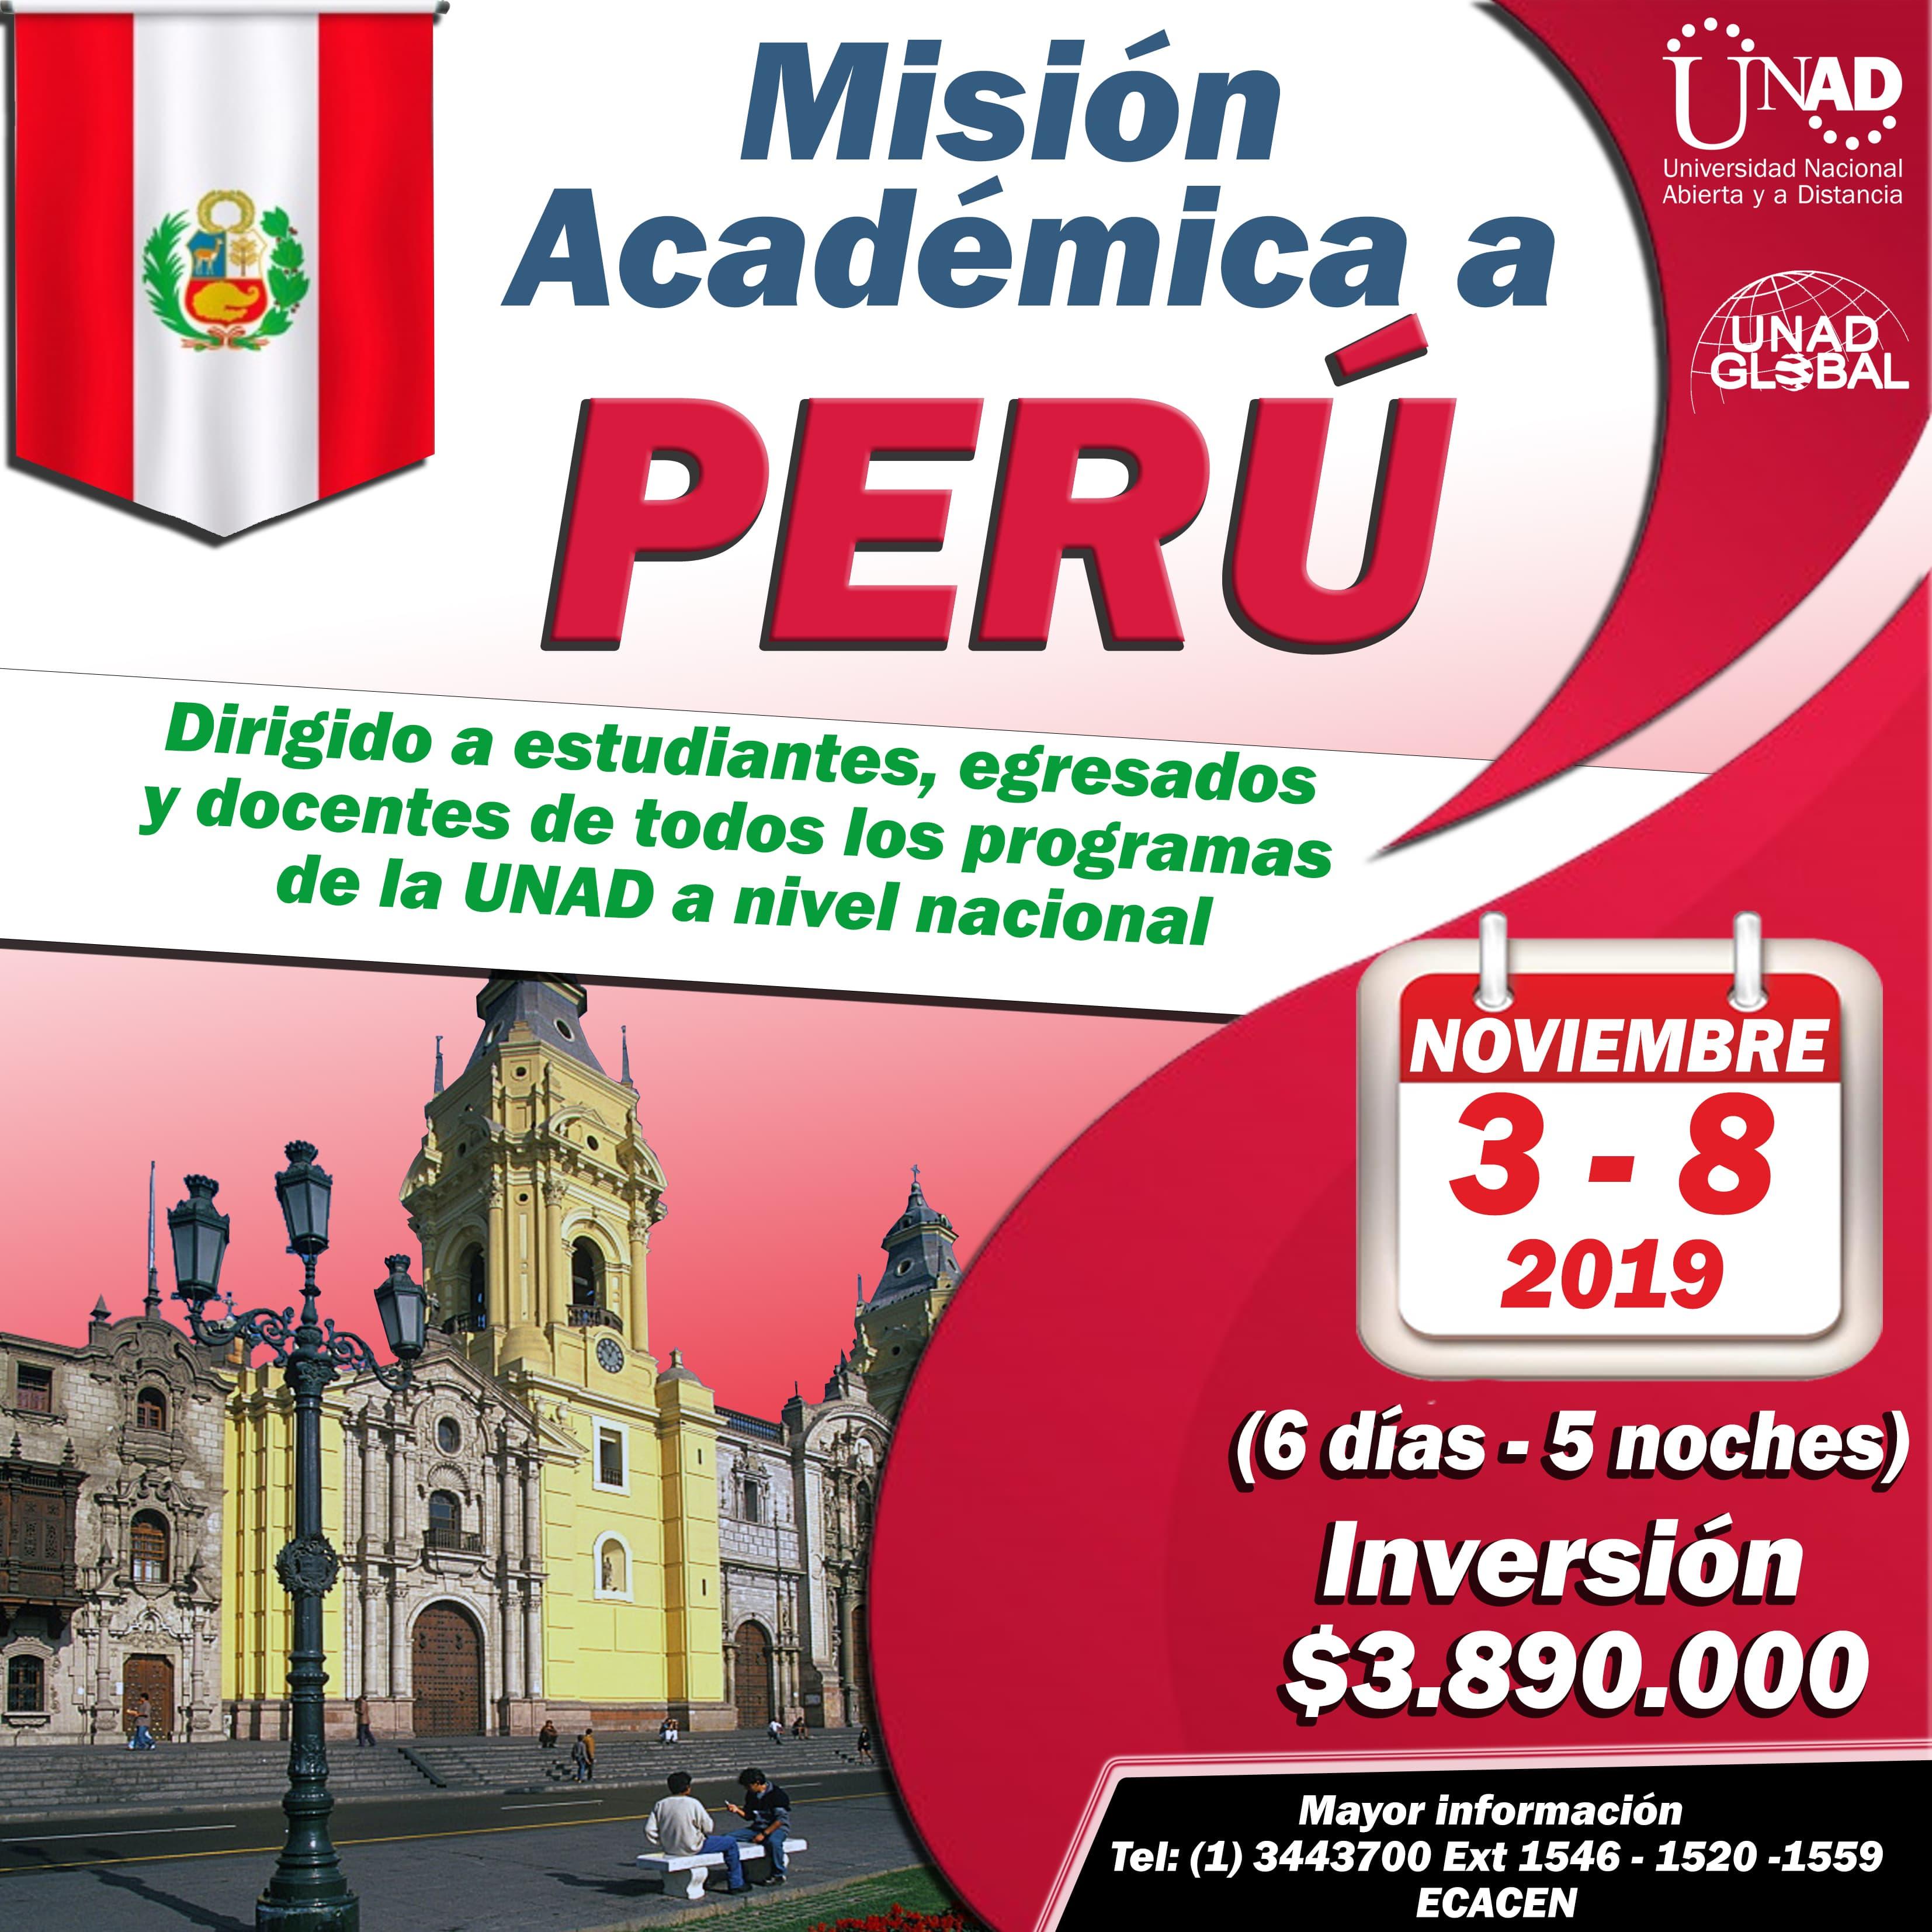 Misión Académica a Perú a 1 min